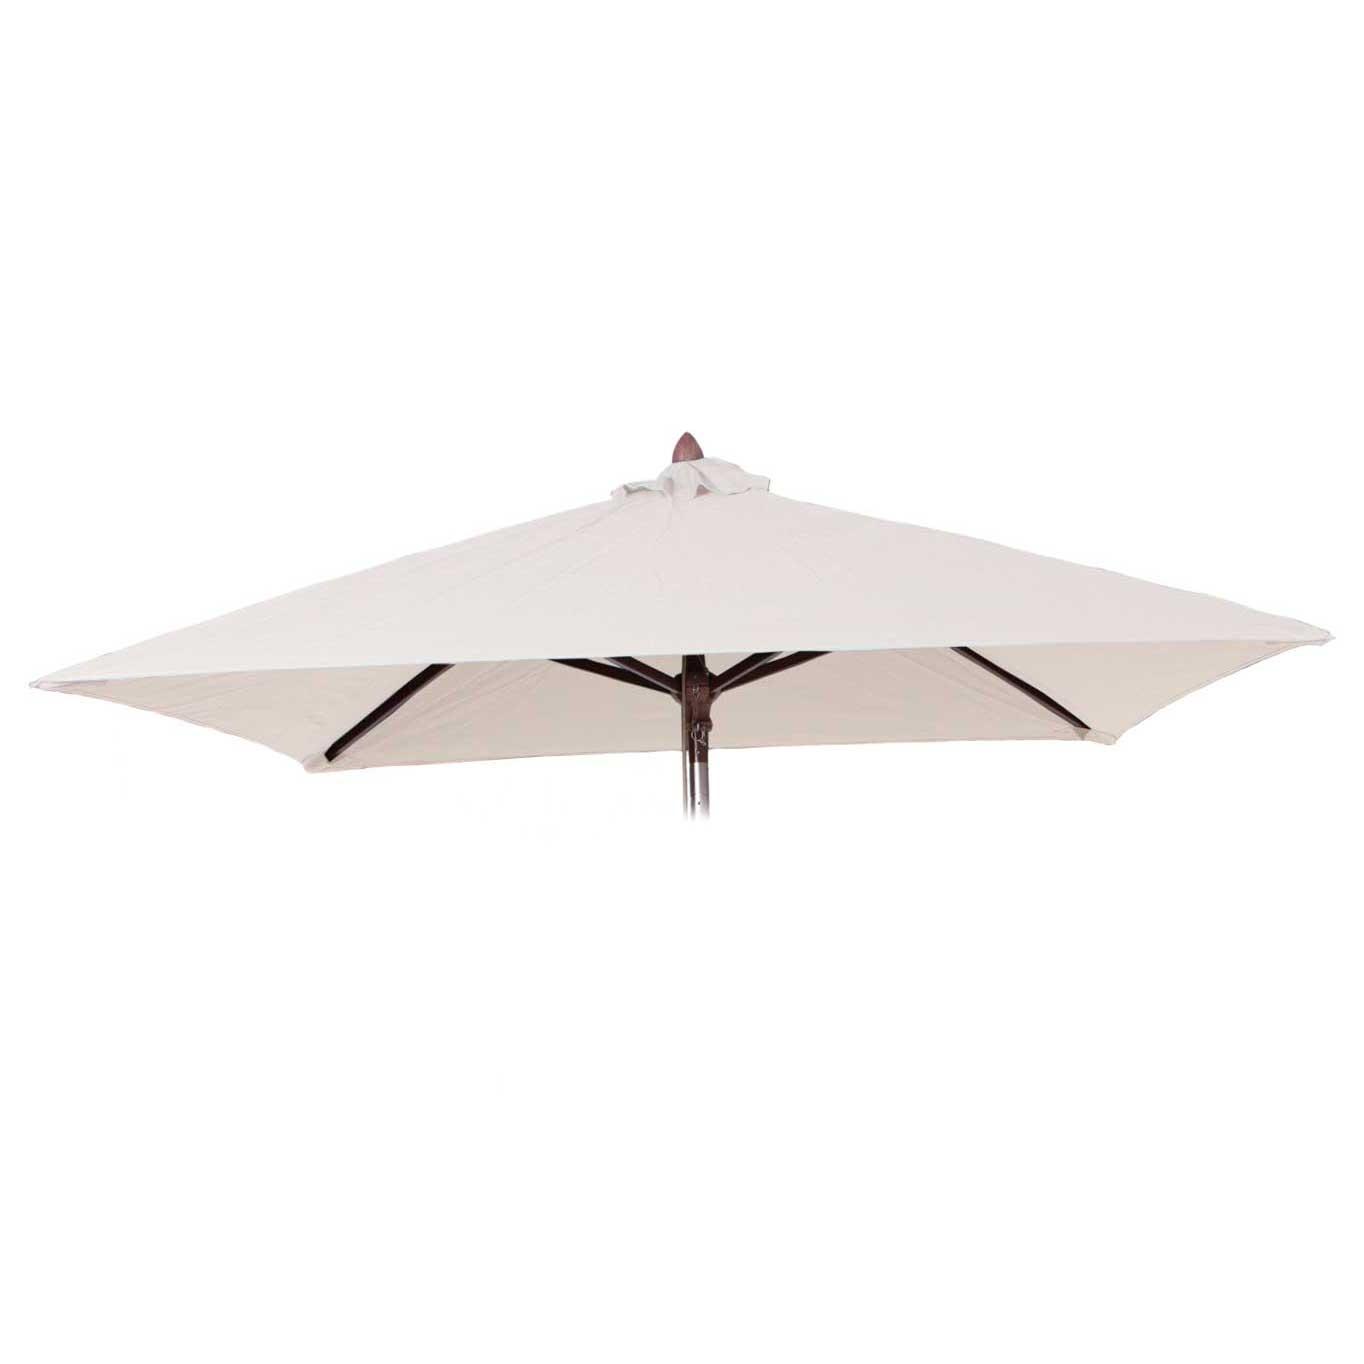 Parasoldoek Borek 200x200cm ecru (olefin)